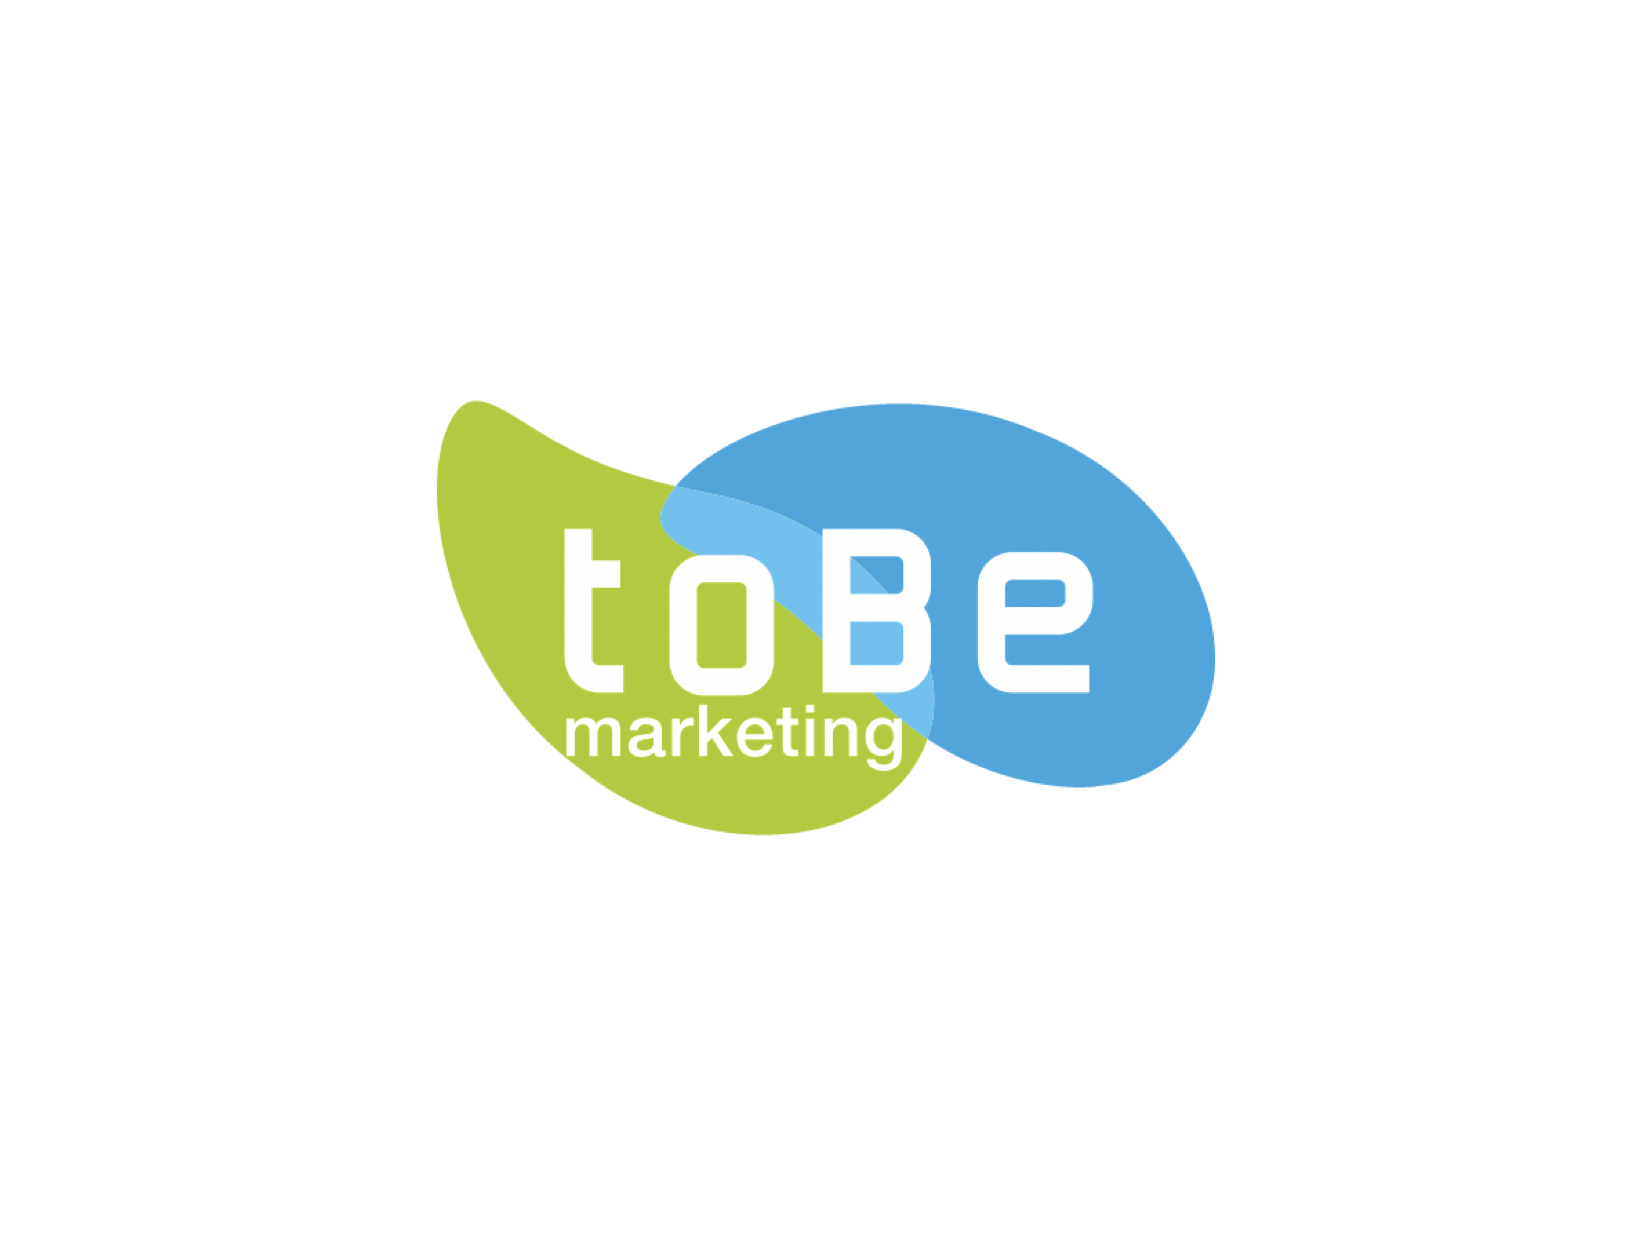 toBeマーケティング | 総額約5.7億円の資金調達を実施、企業のデジタルマーケティング支援展開を加速